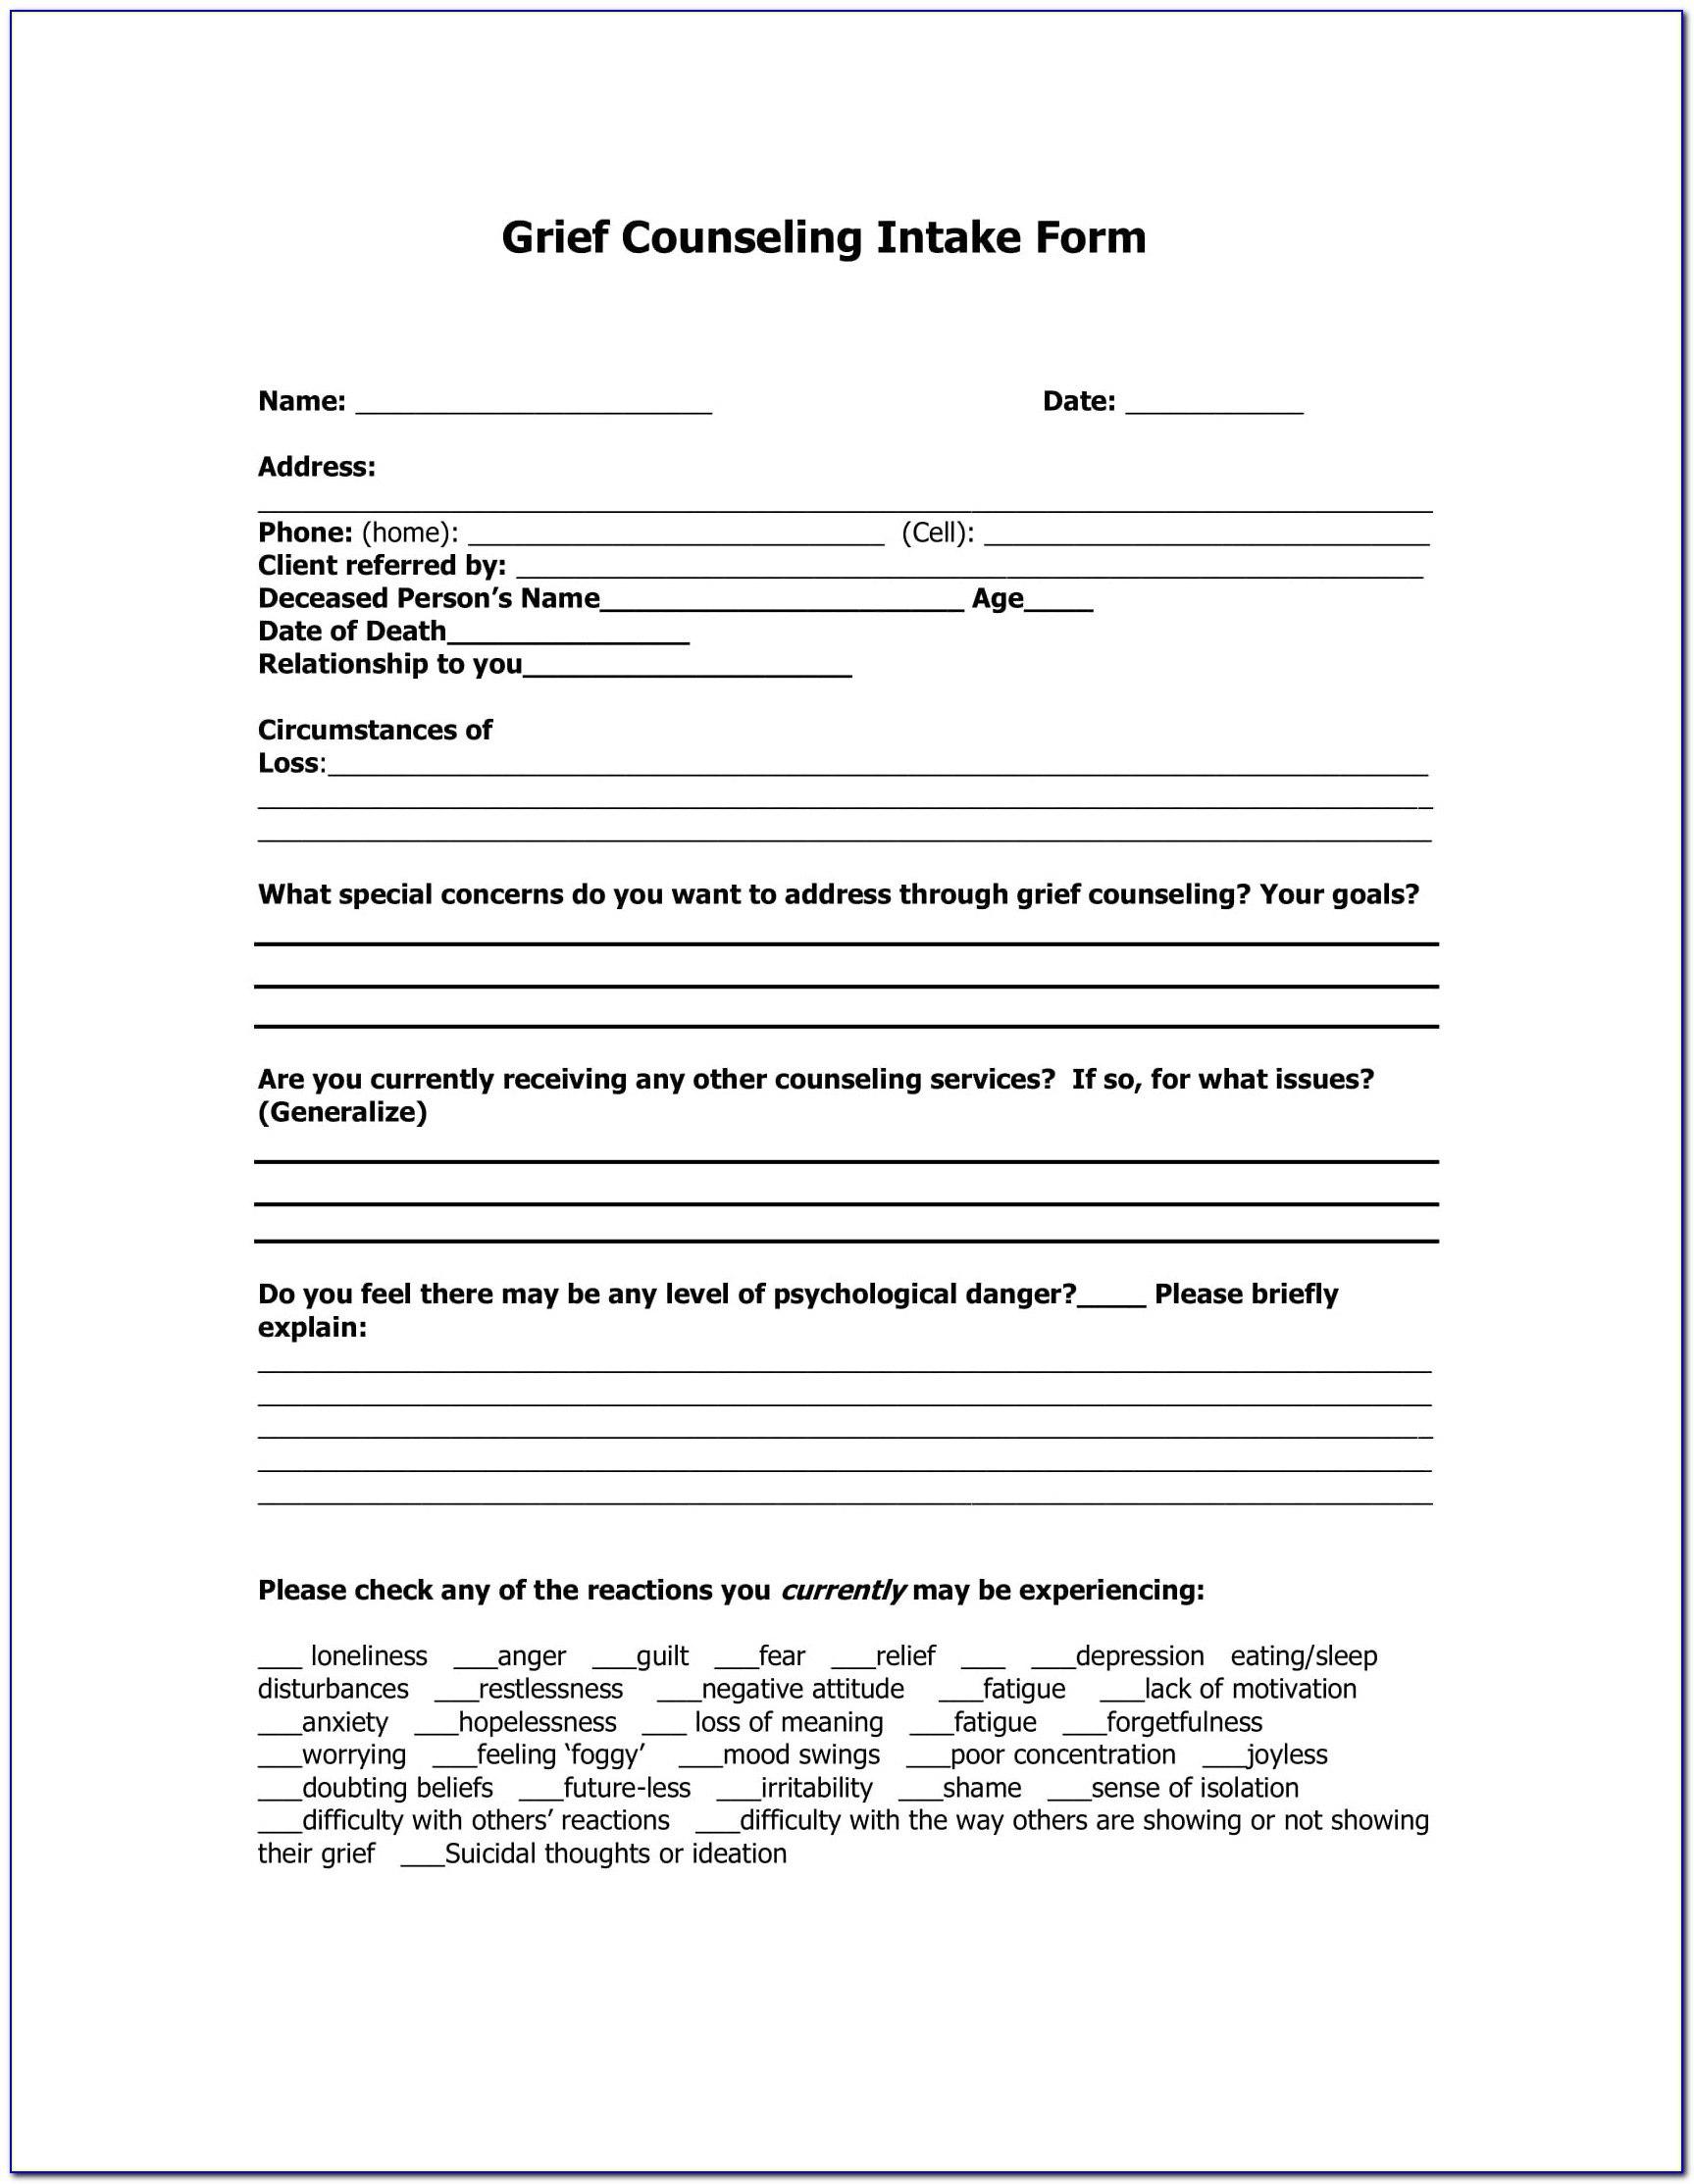 Premarital Counseling Certificate Of Completion Template New For Premarital Counseling Certificate Of Completion Template